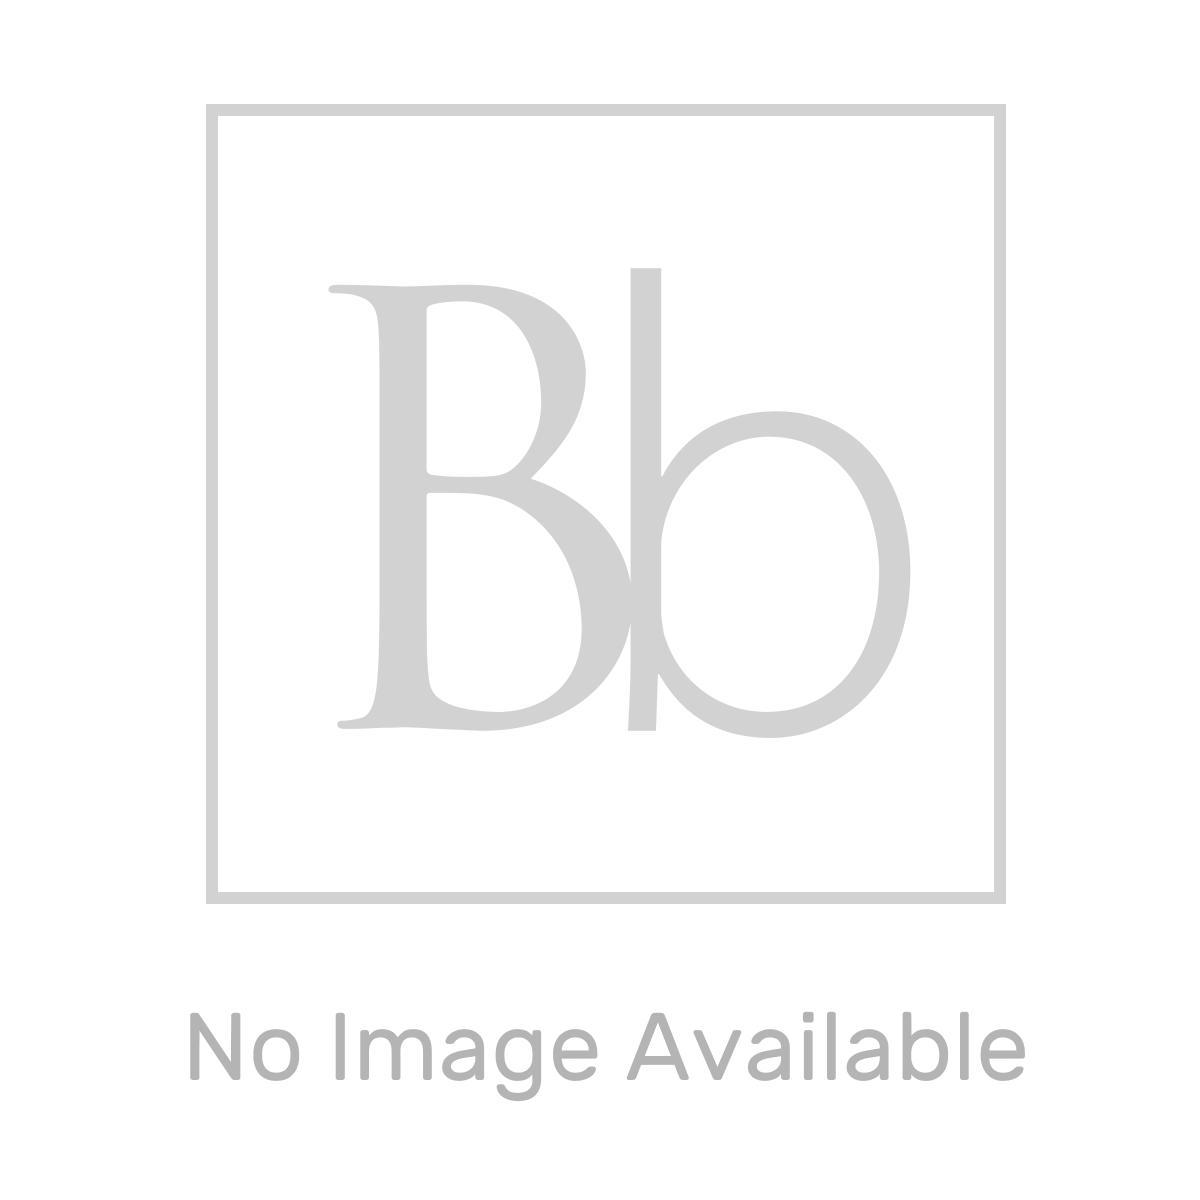 Croydex Adjustable Shower Wall Bracket Chrome